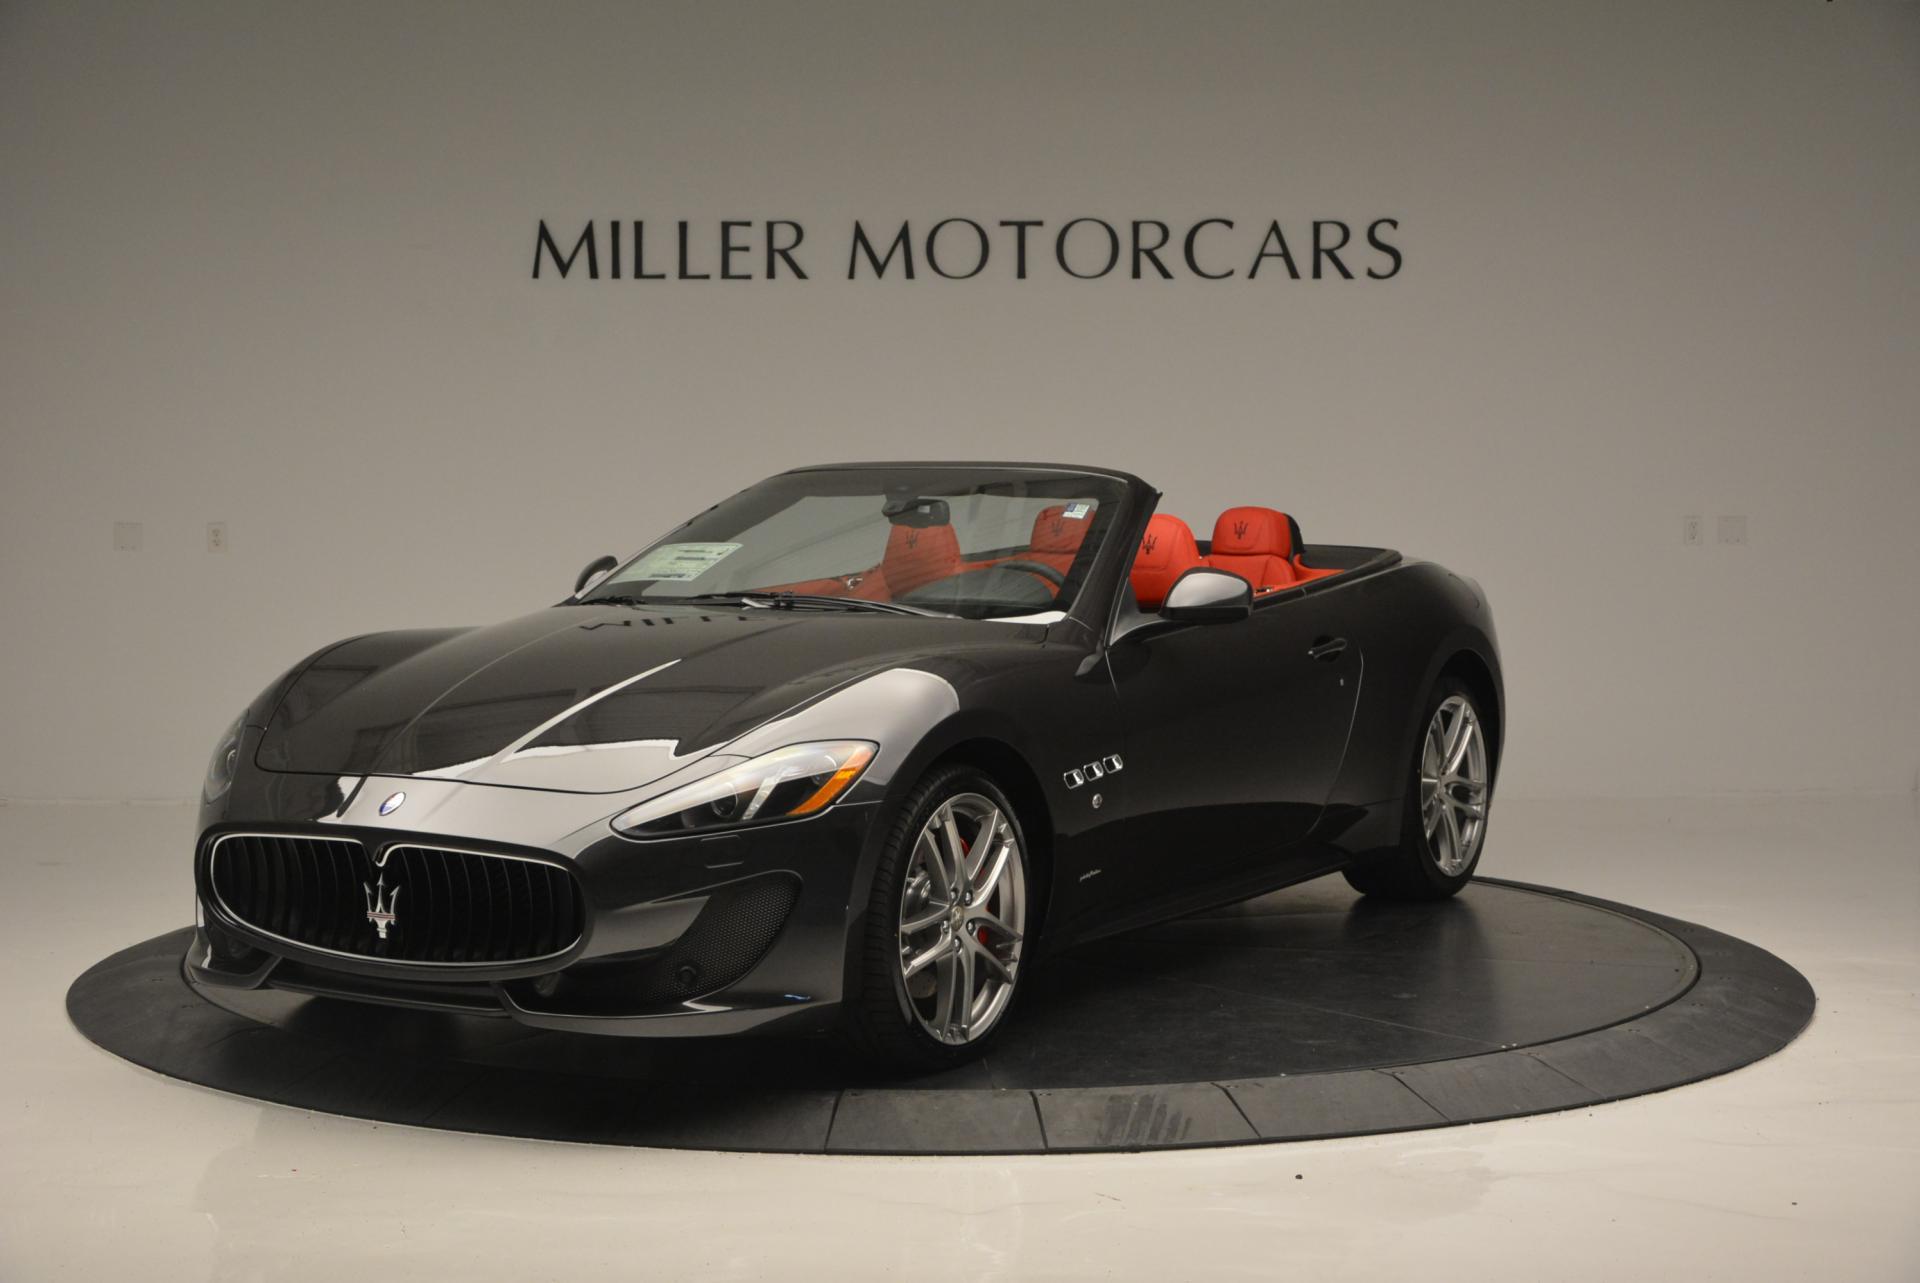 New 2017 Maserati GranTurismo Convertible Sport for sale Sold at Pagani of Greenwich in Greenwich CT 06830 1